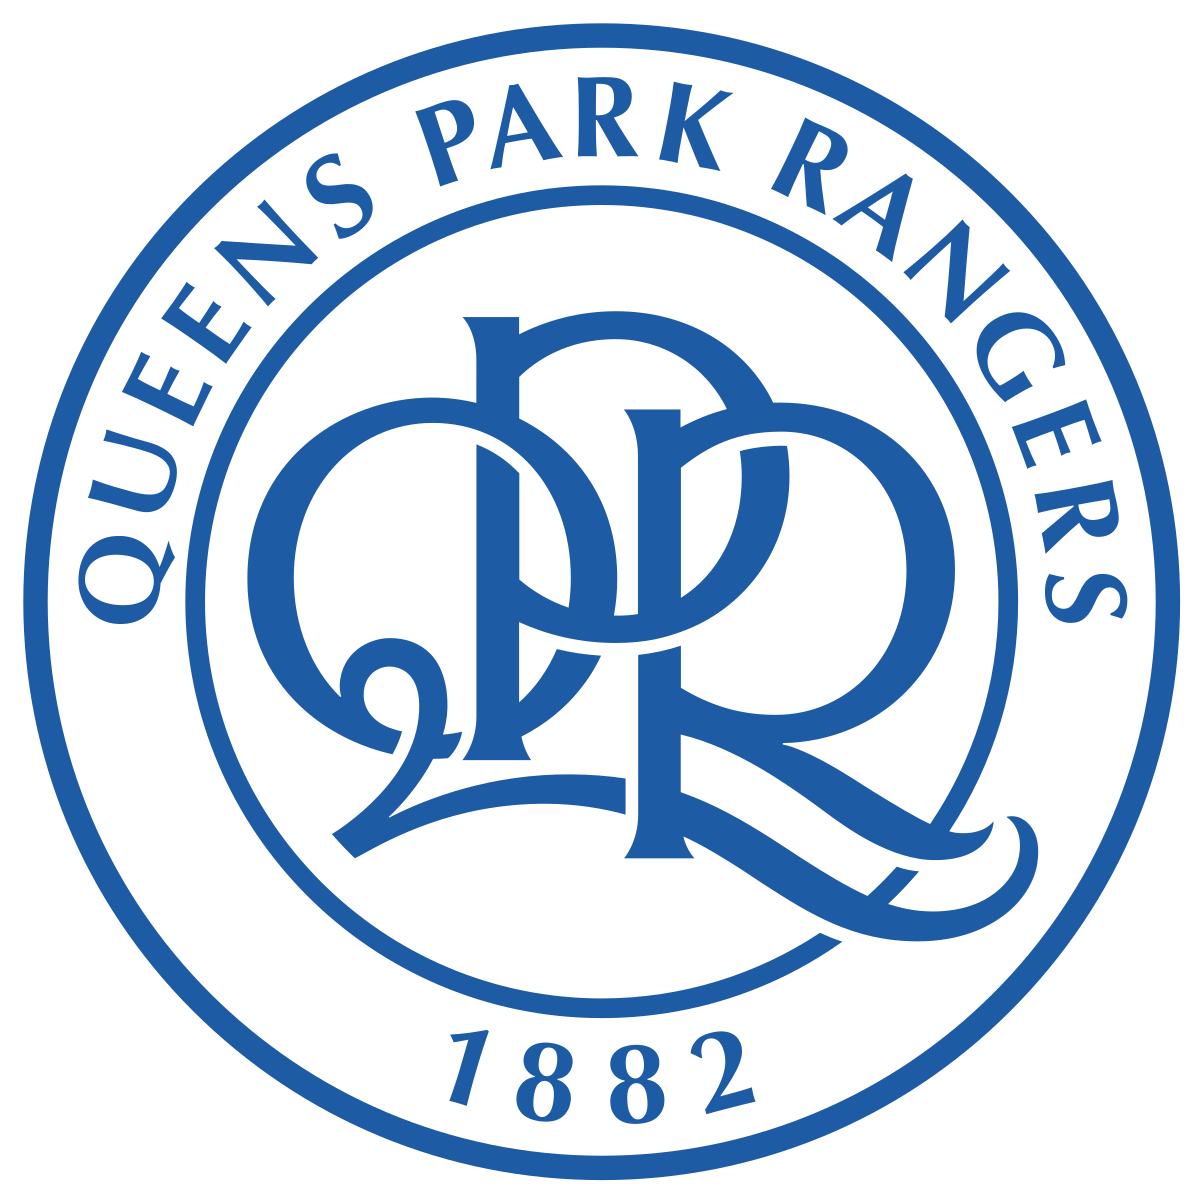 QPR team logo